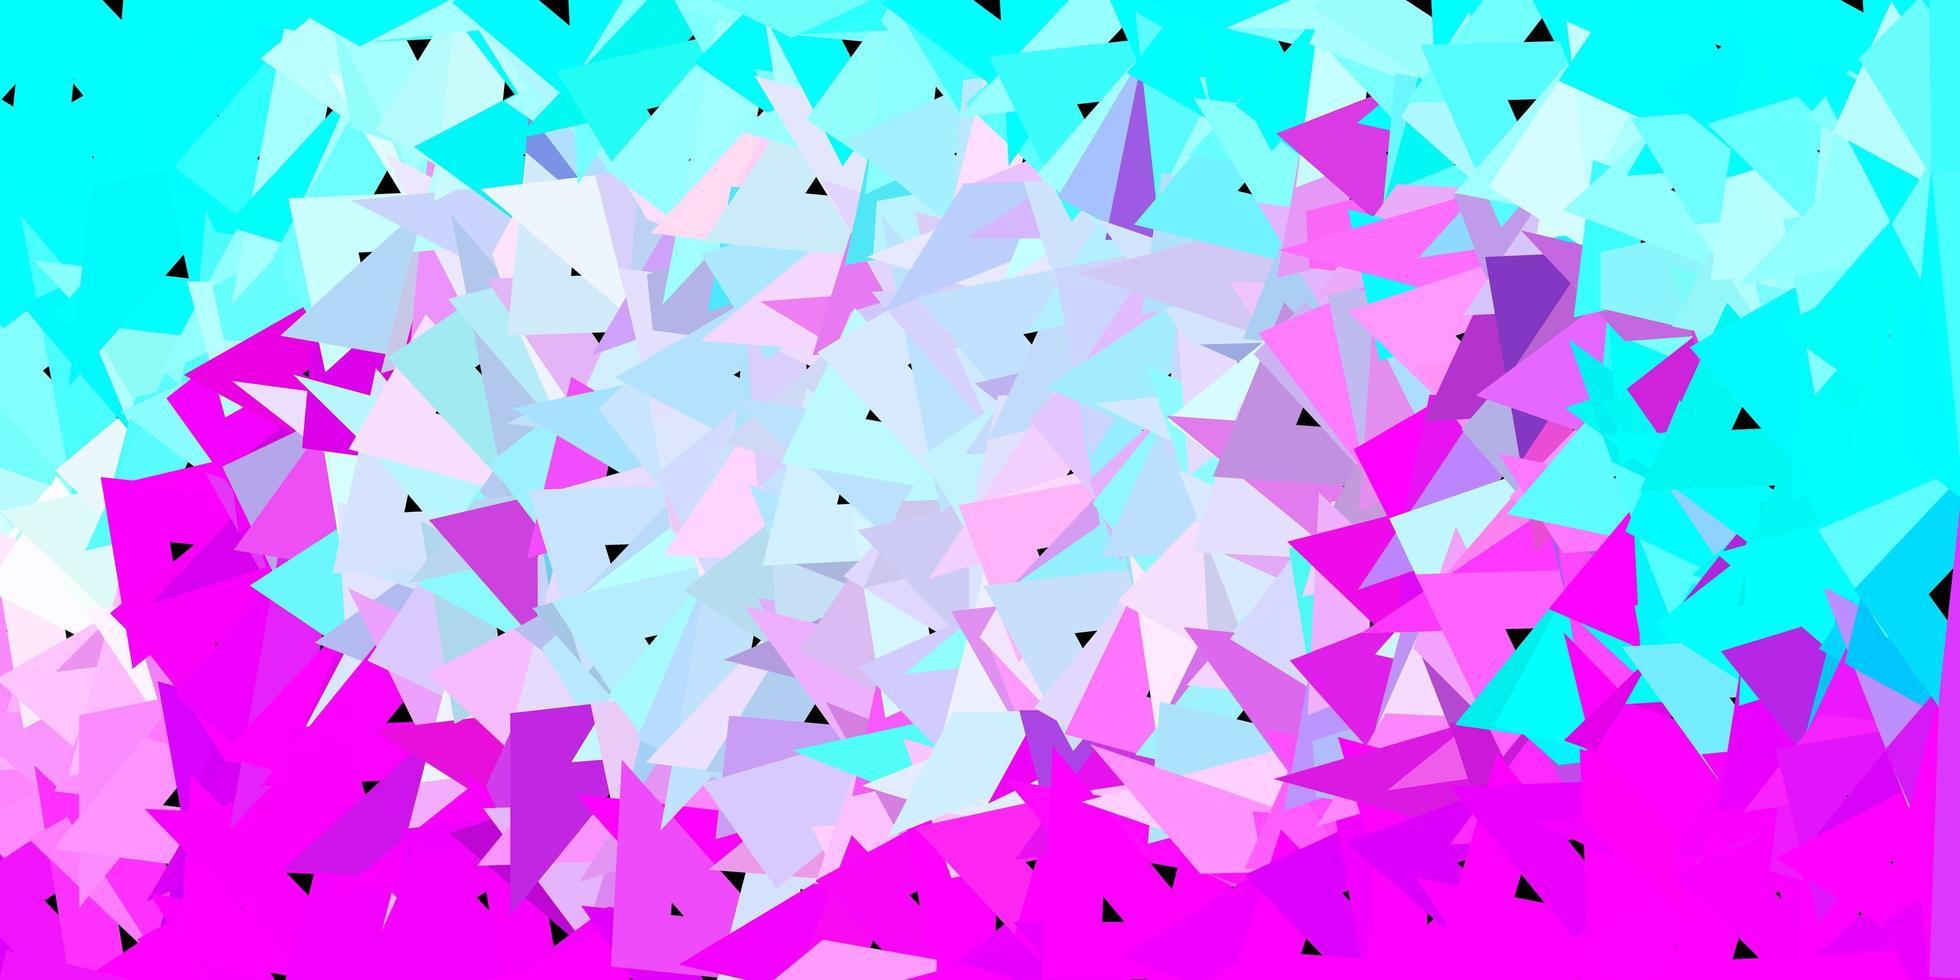 hellrosa, blaues Vektor-Poly-Dreieck-Layout. vektor